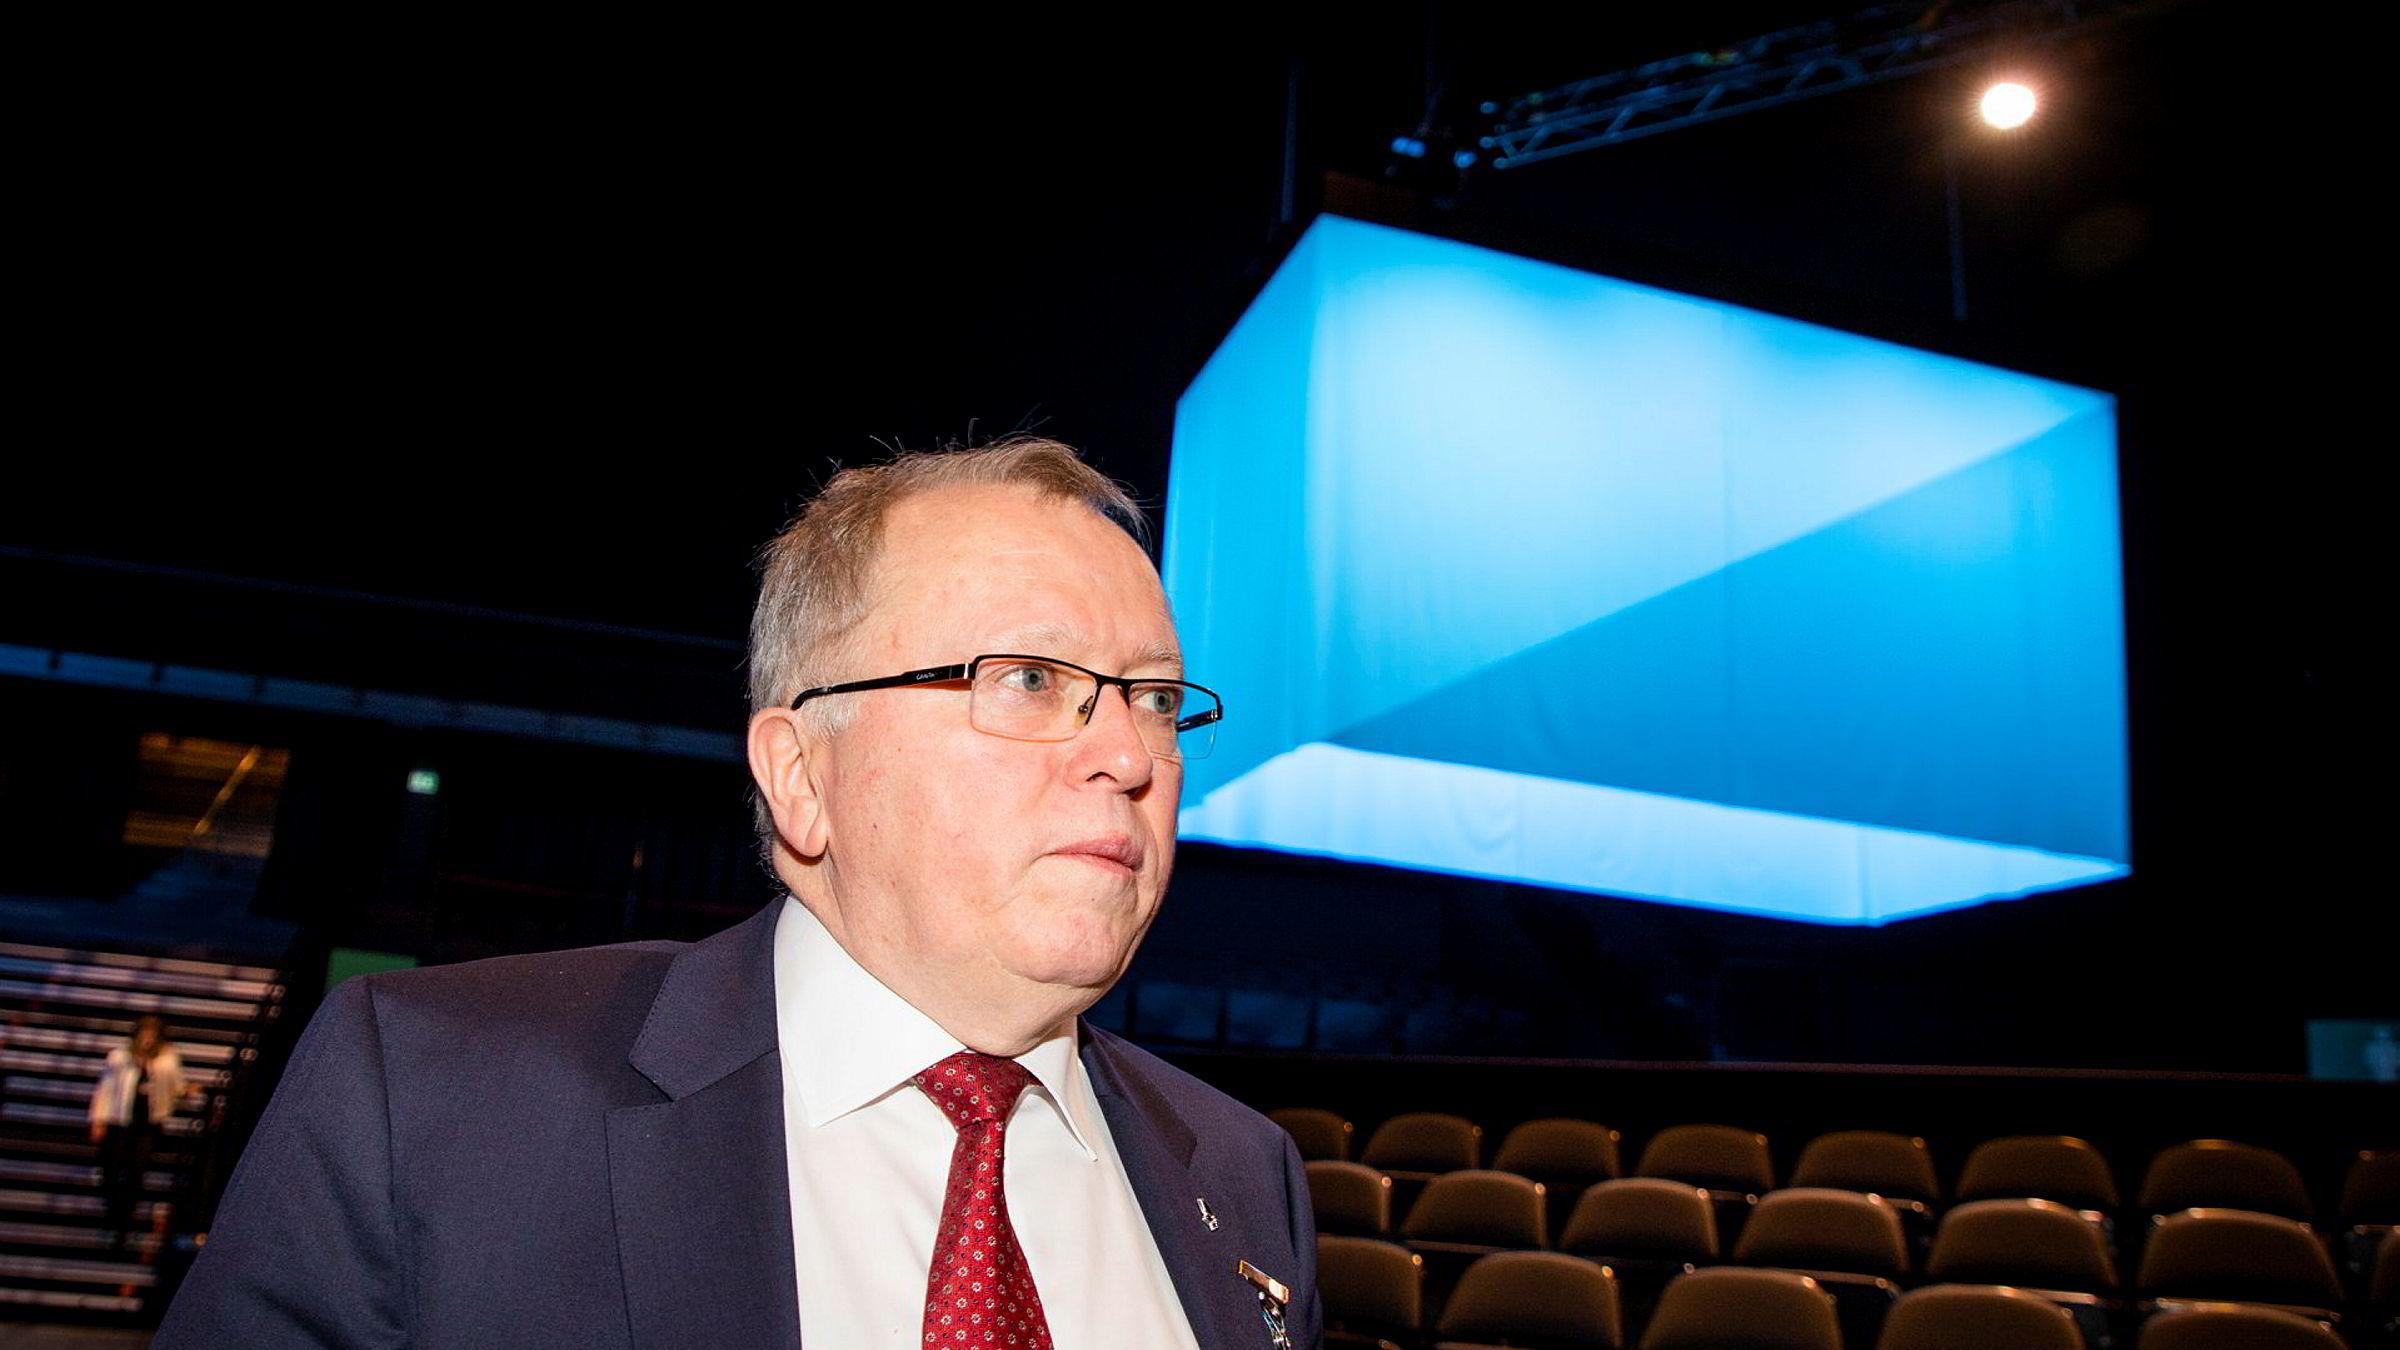 Konsernsjef Eldar Sætre i Equinor er bekymret for utviklingen i Midtøsten.